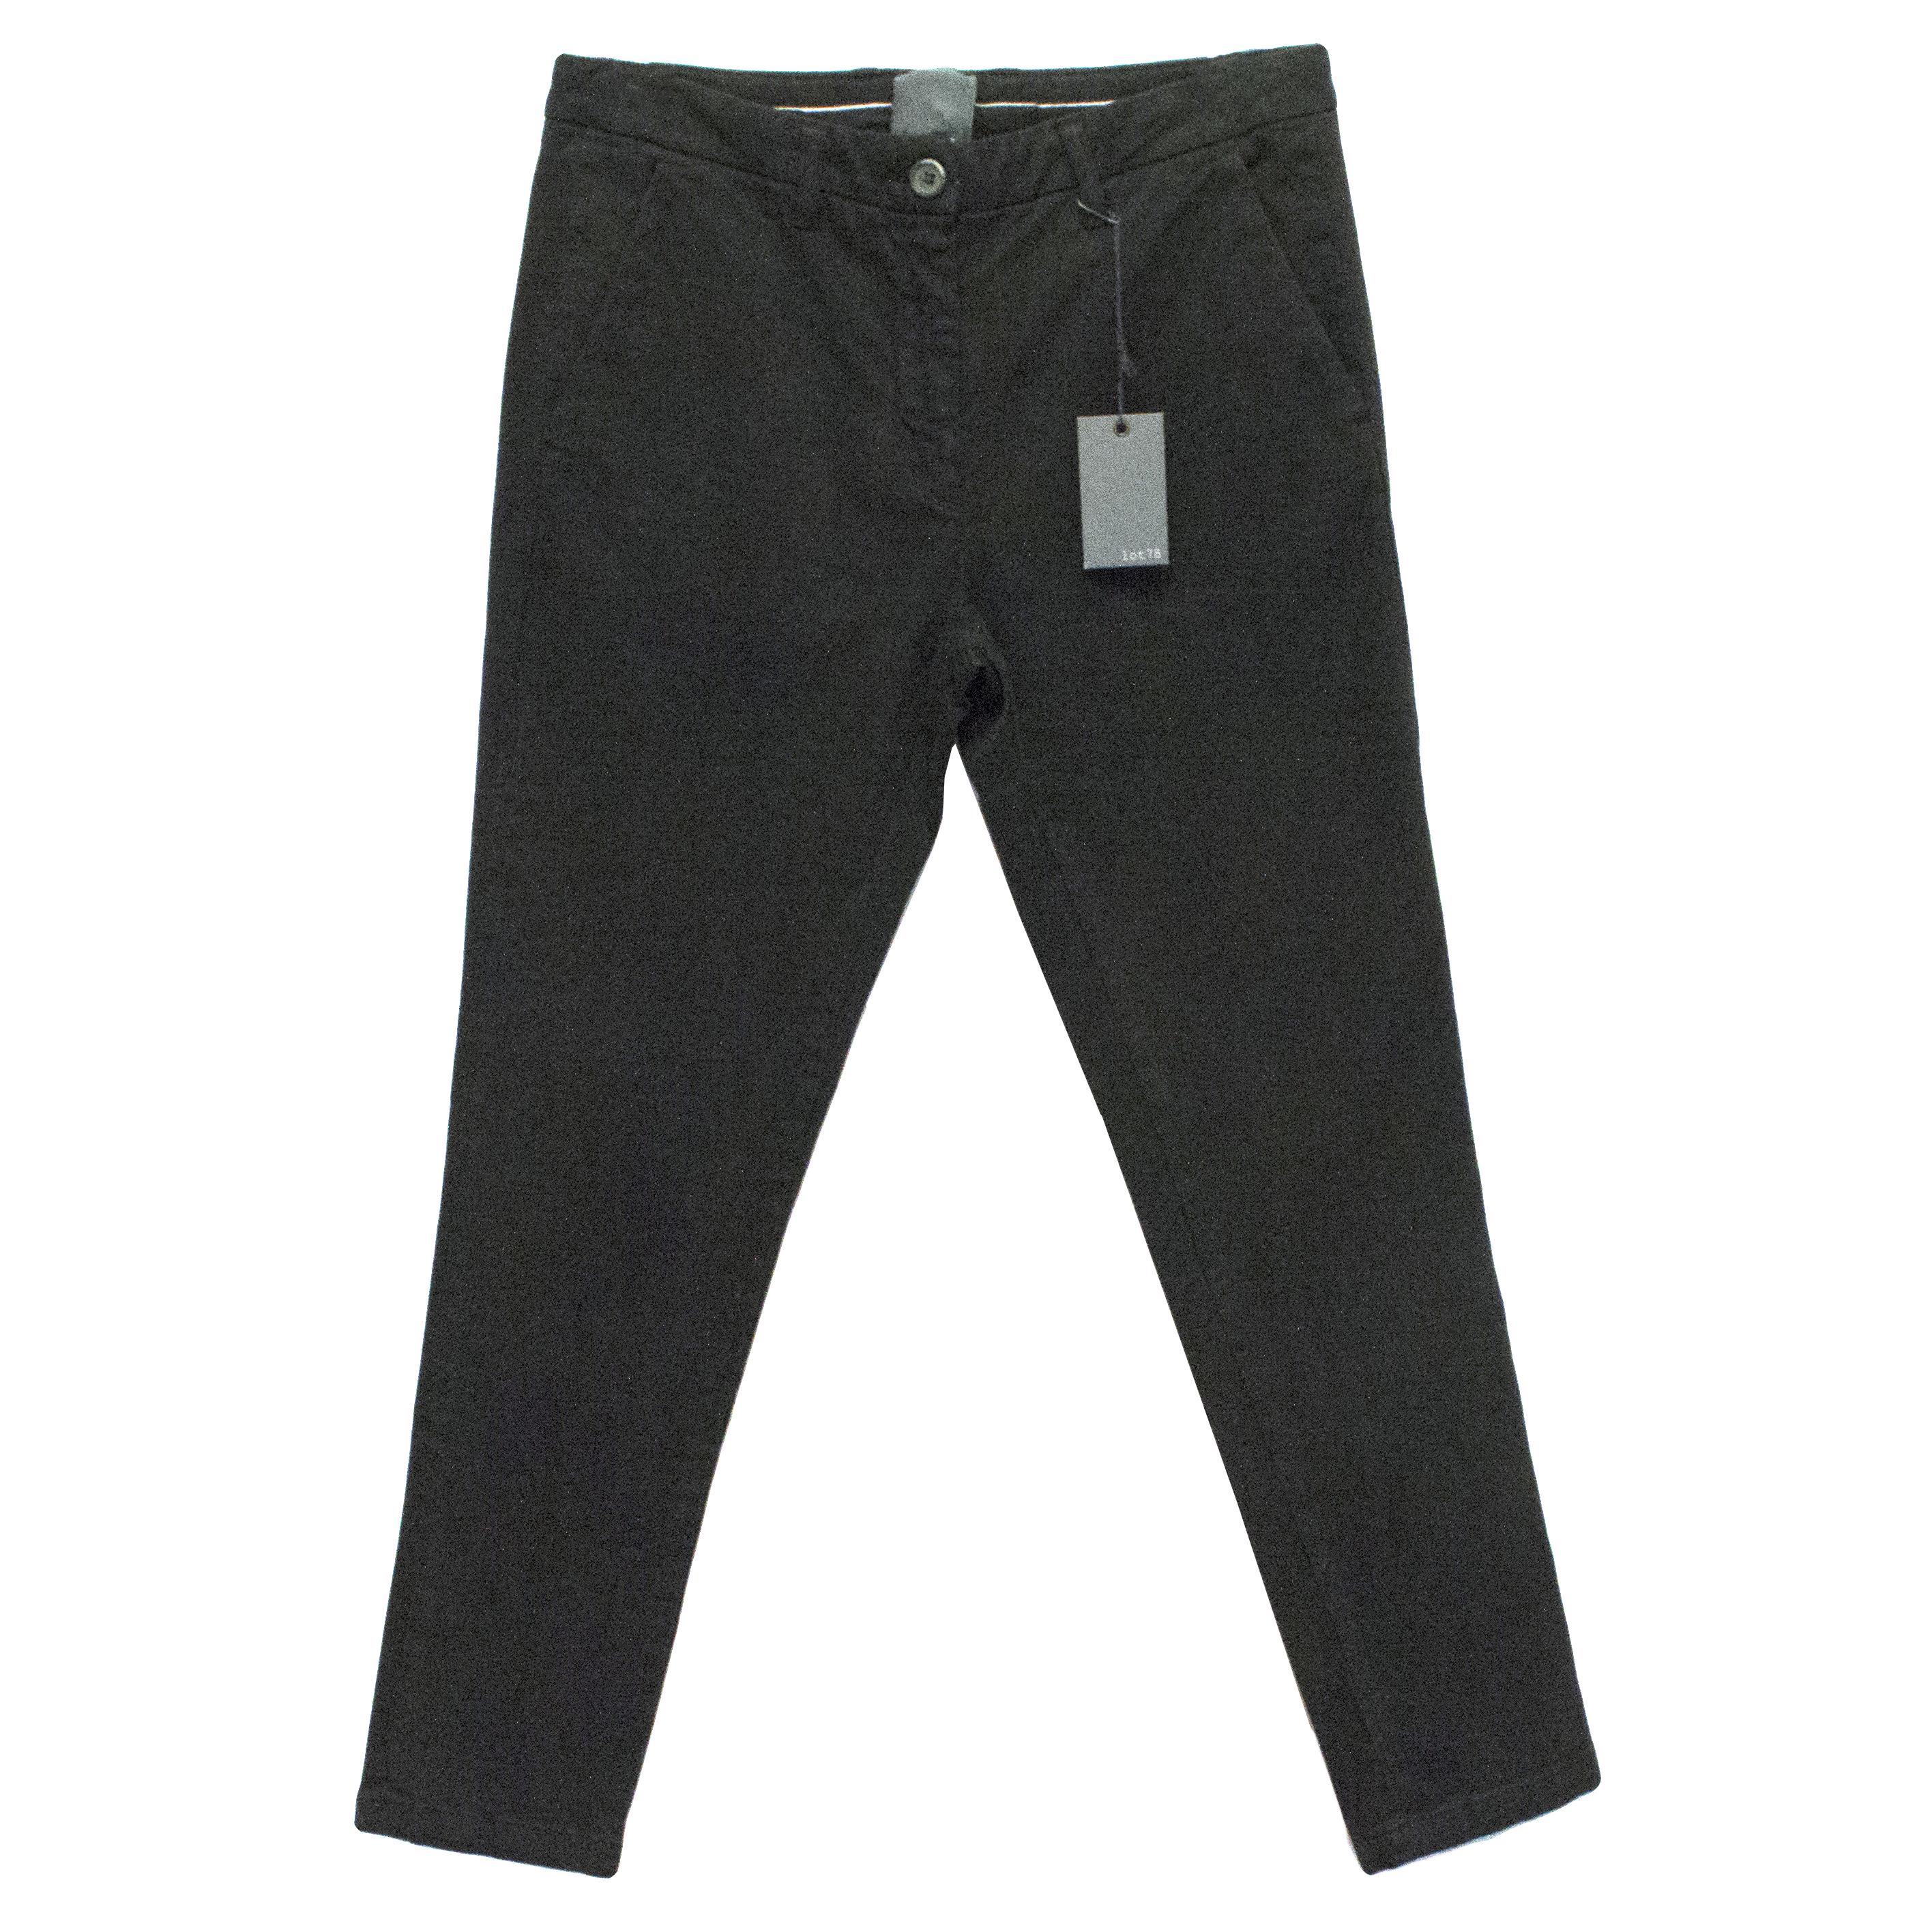 Lot78 Black Chino Trousers